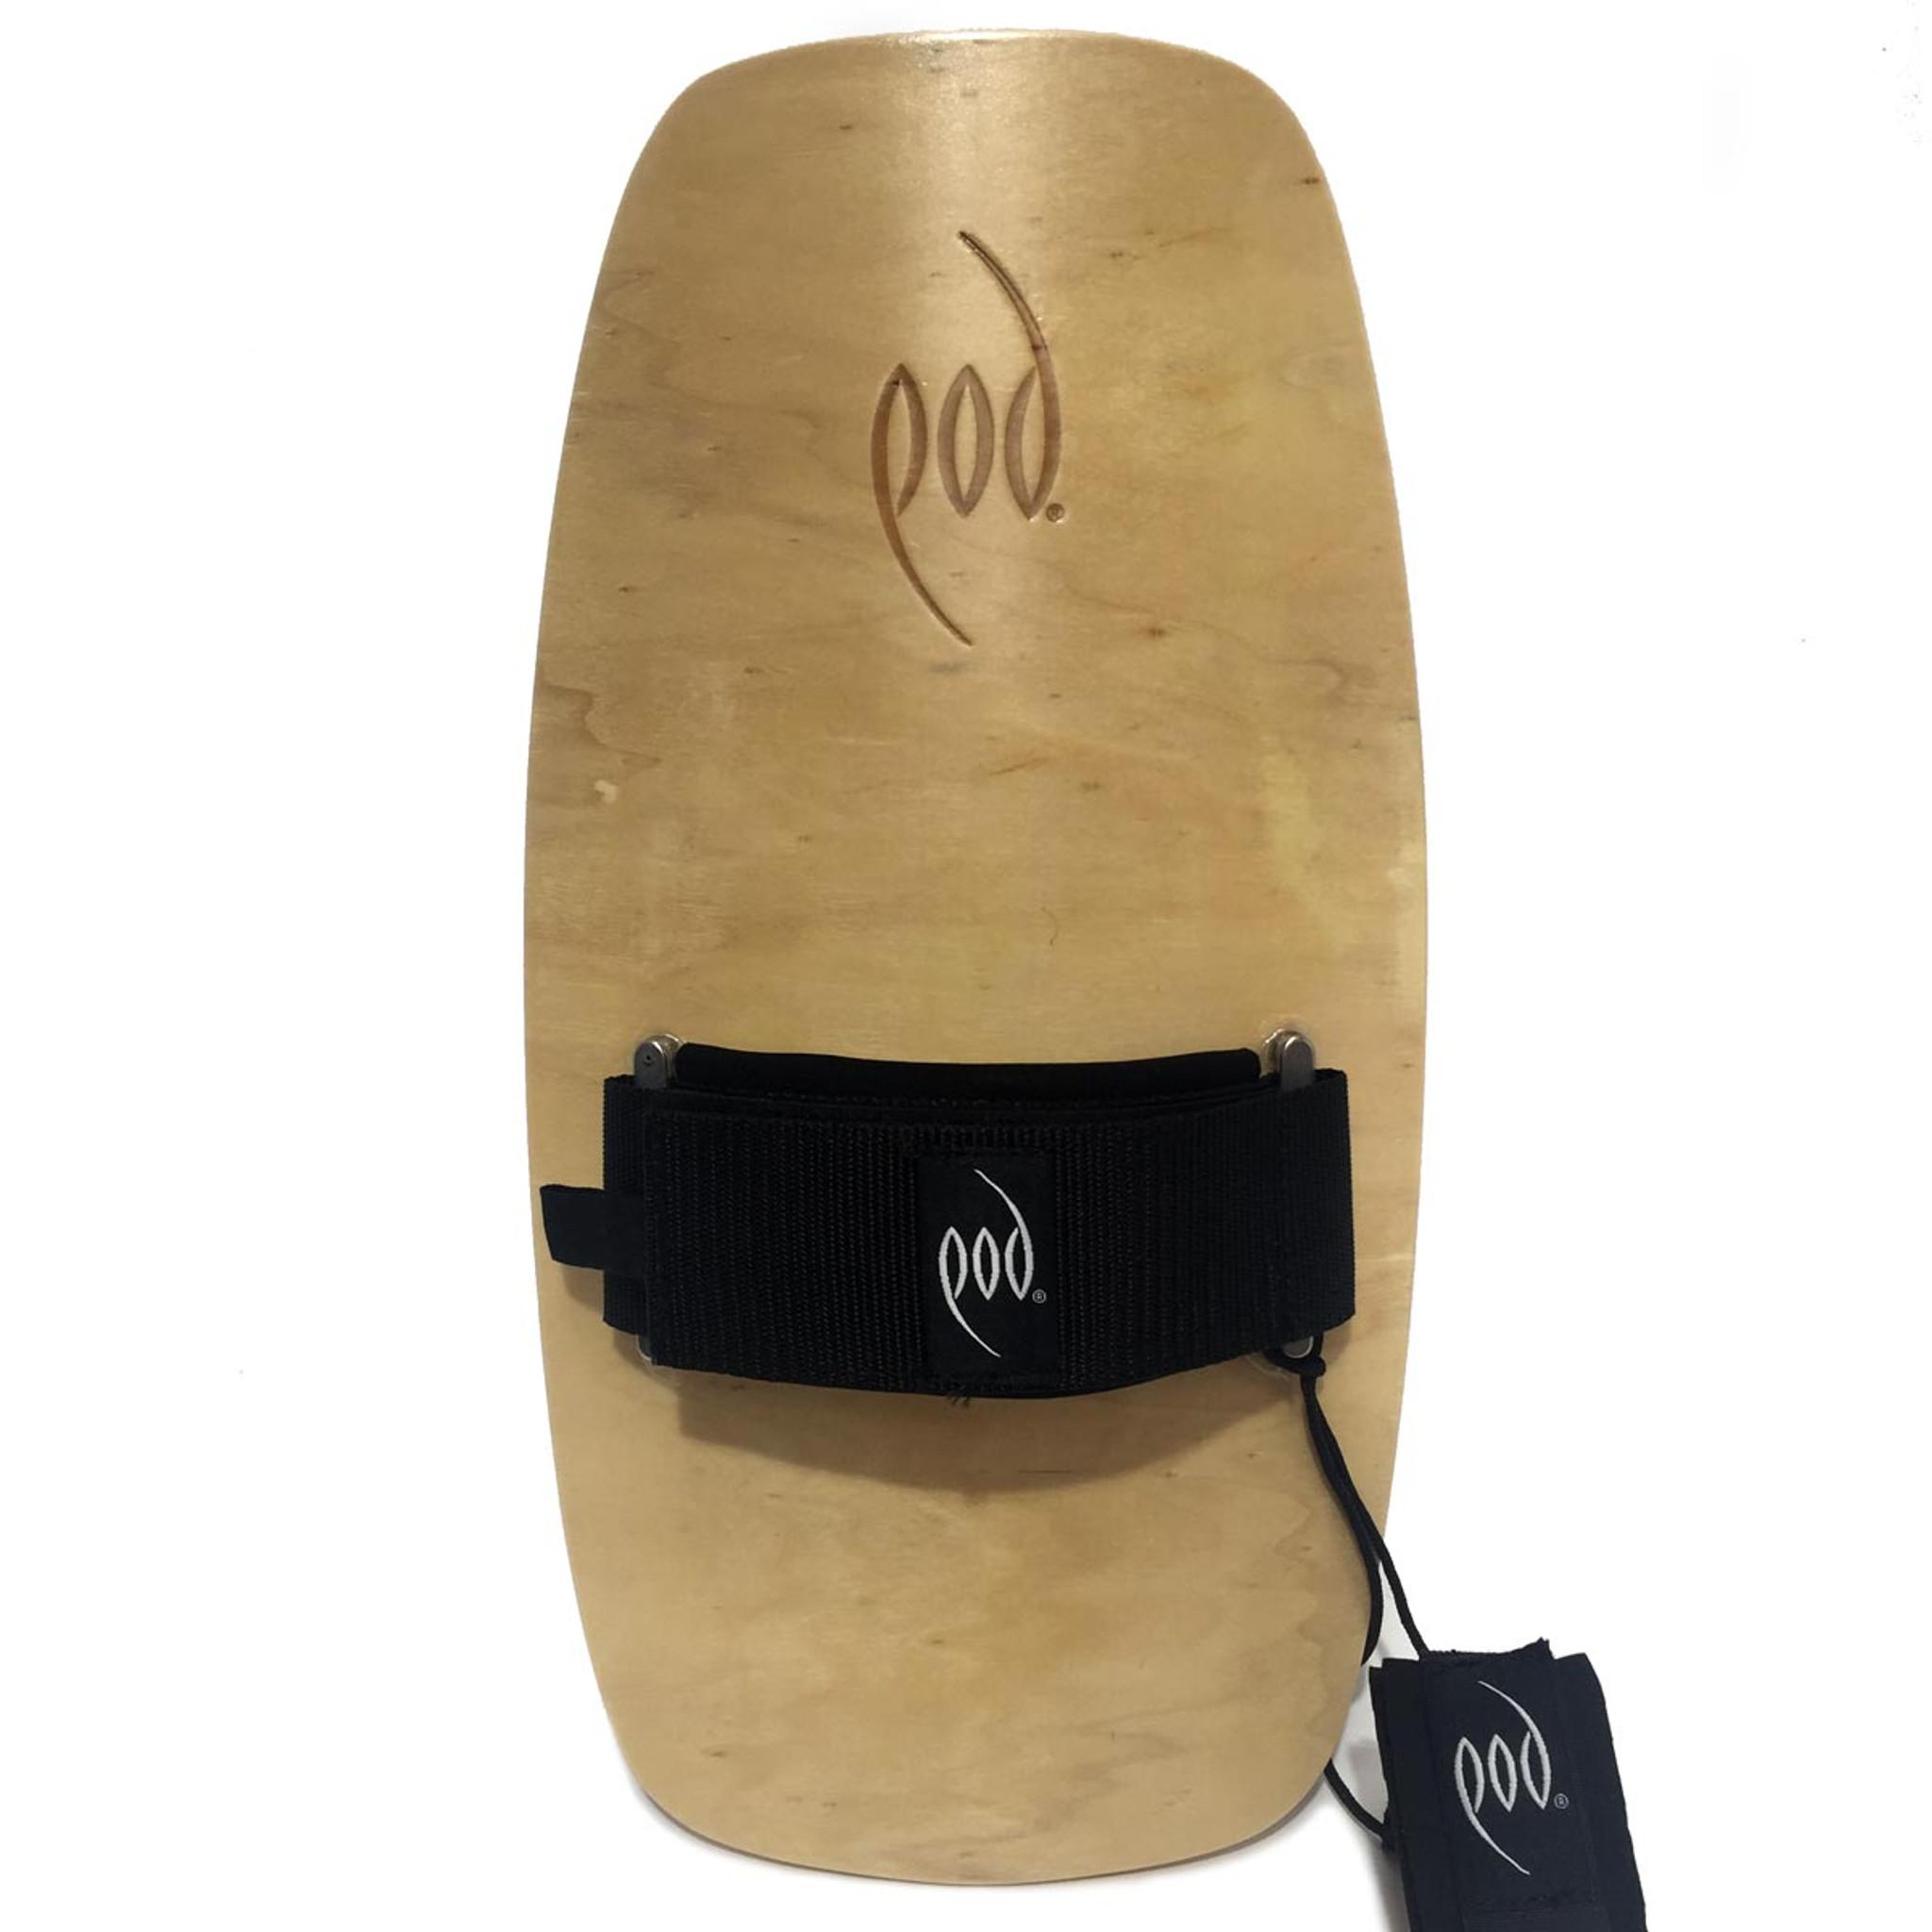 Bodysurfing Handboards - Hand Body Soul - Wood Handplane